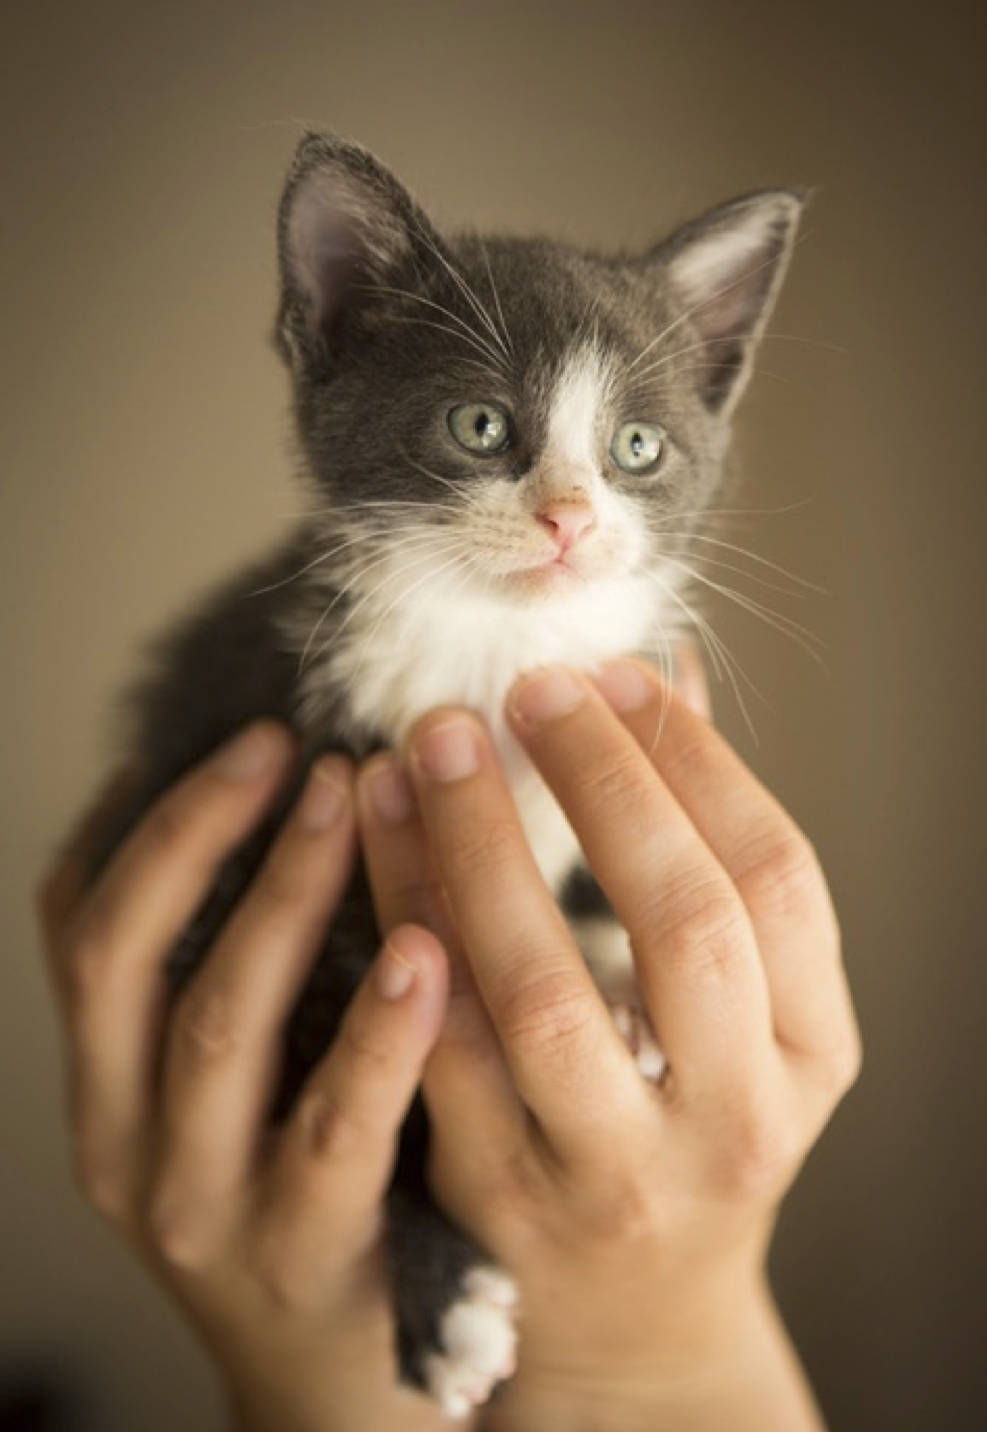 kitten veritcal